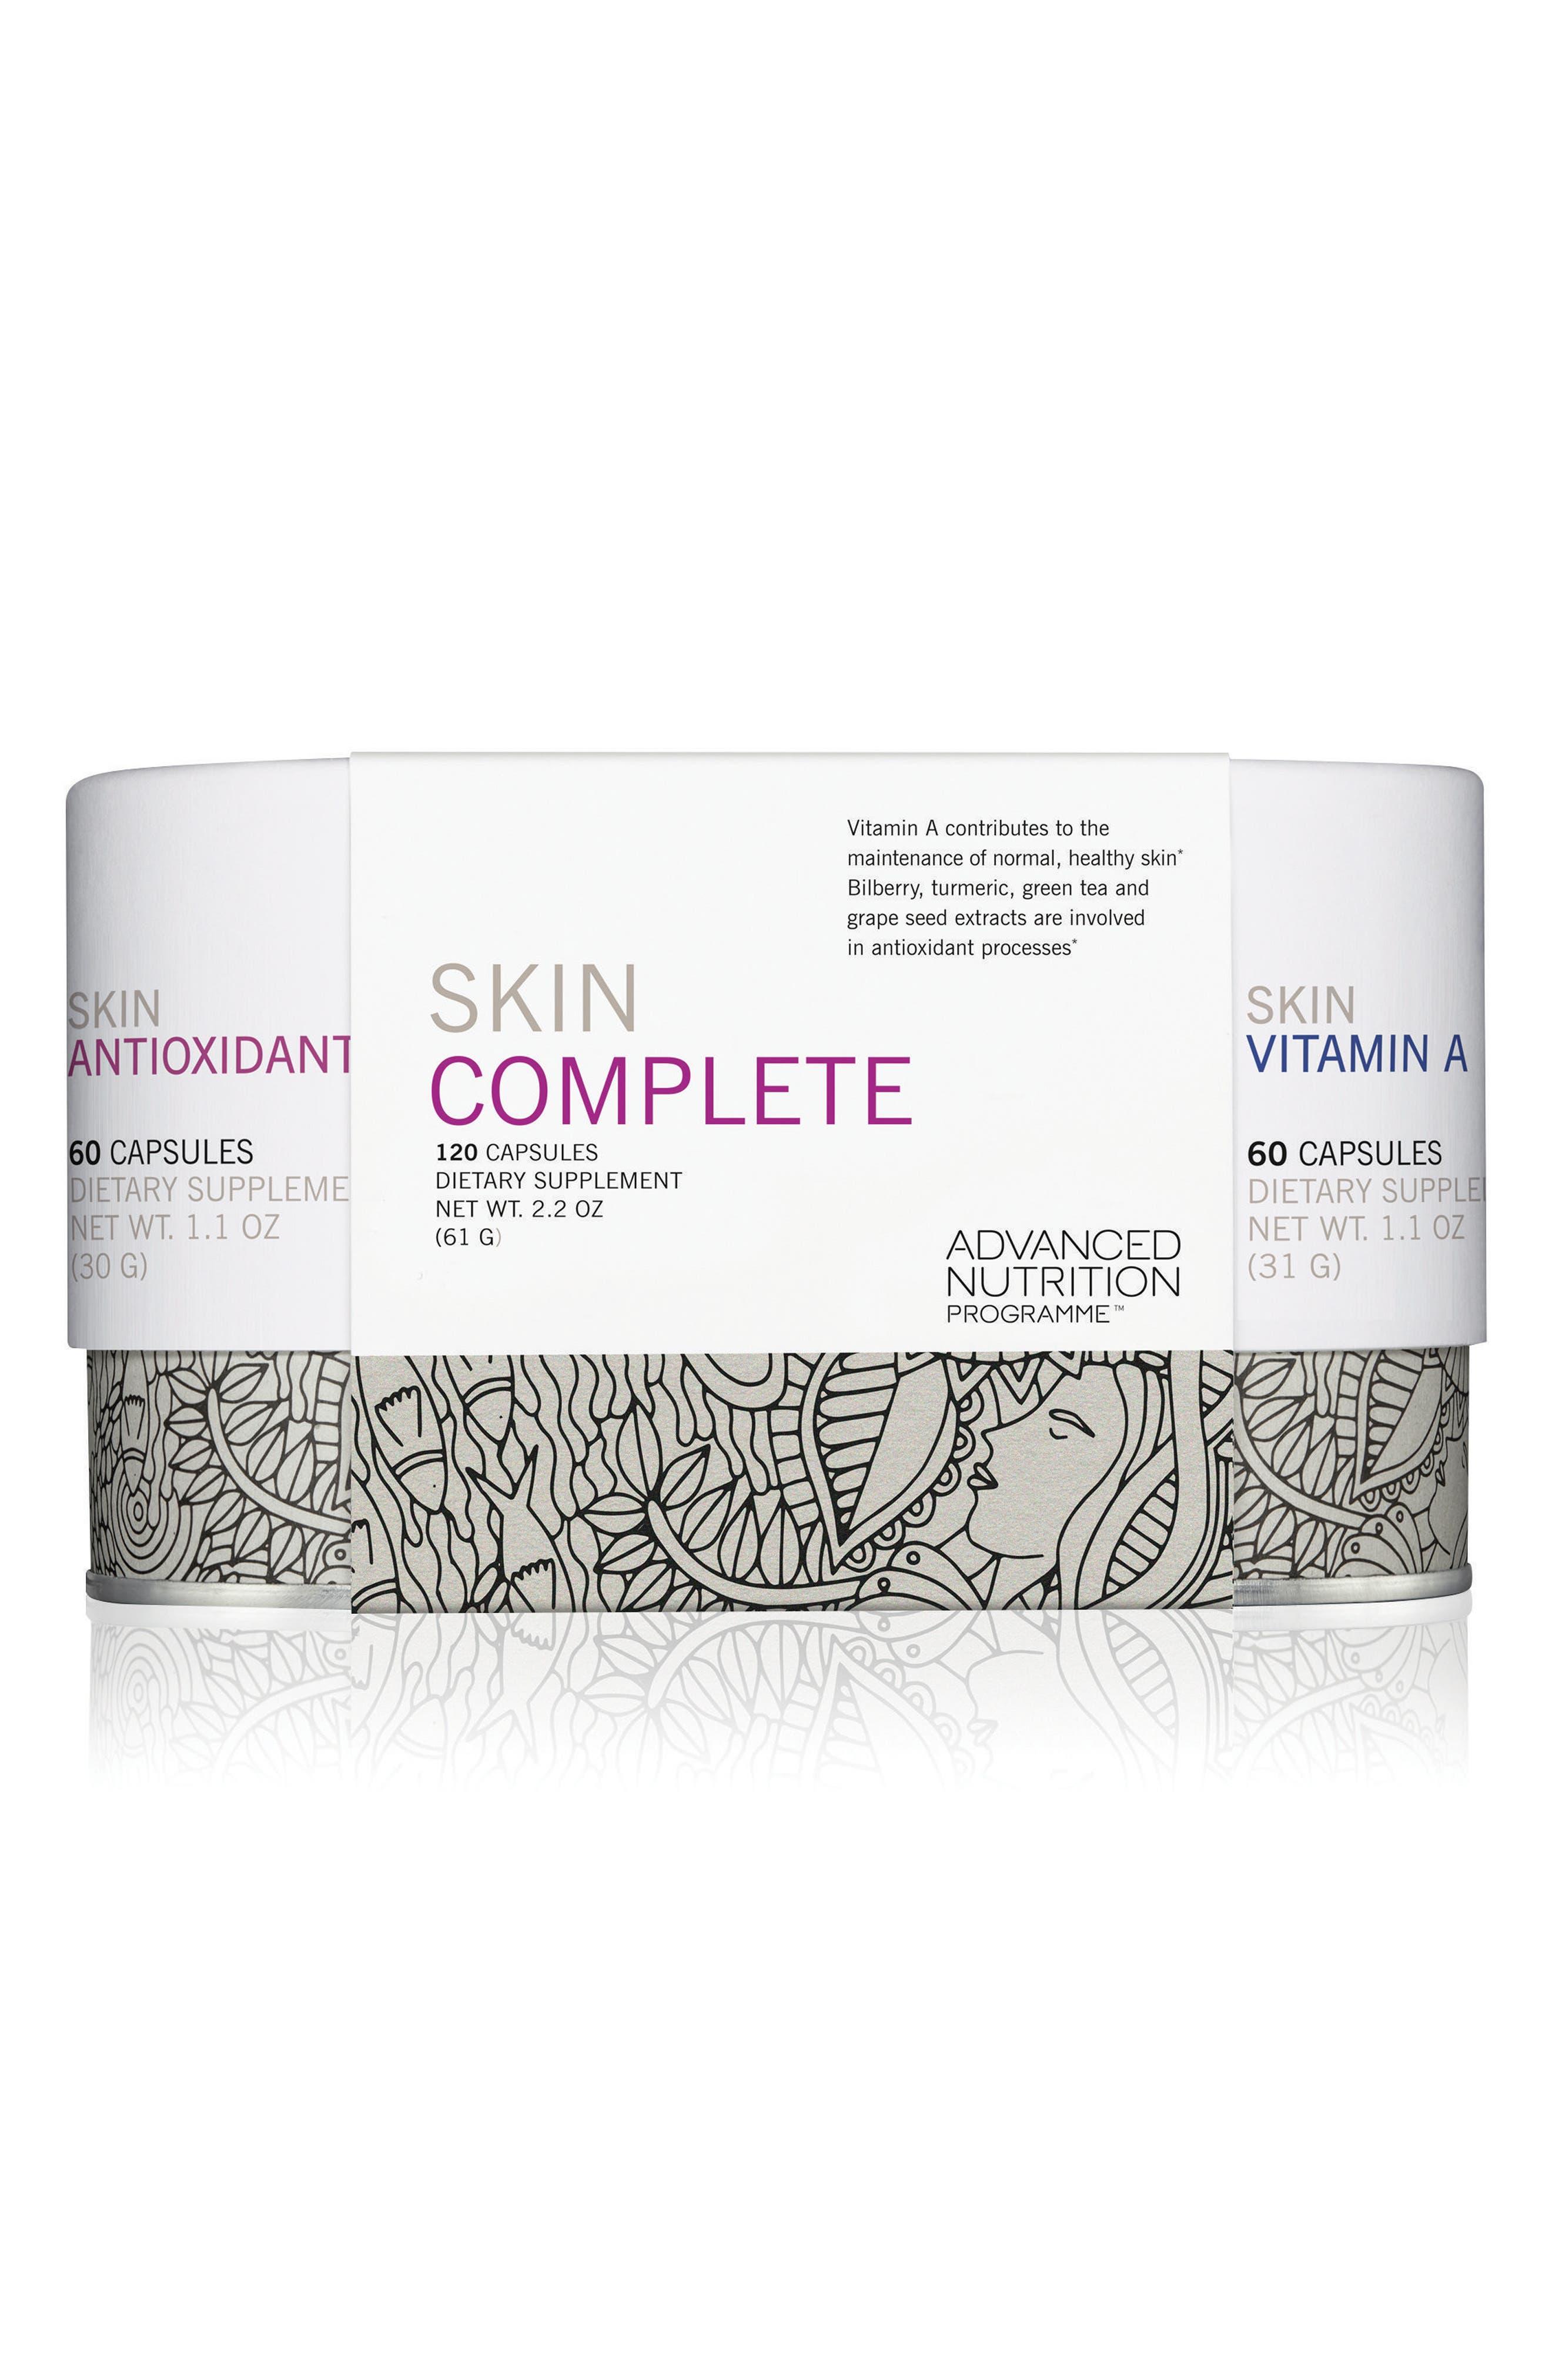 jane irdeale Skin Complete Dietary Supplement Duo